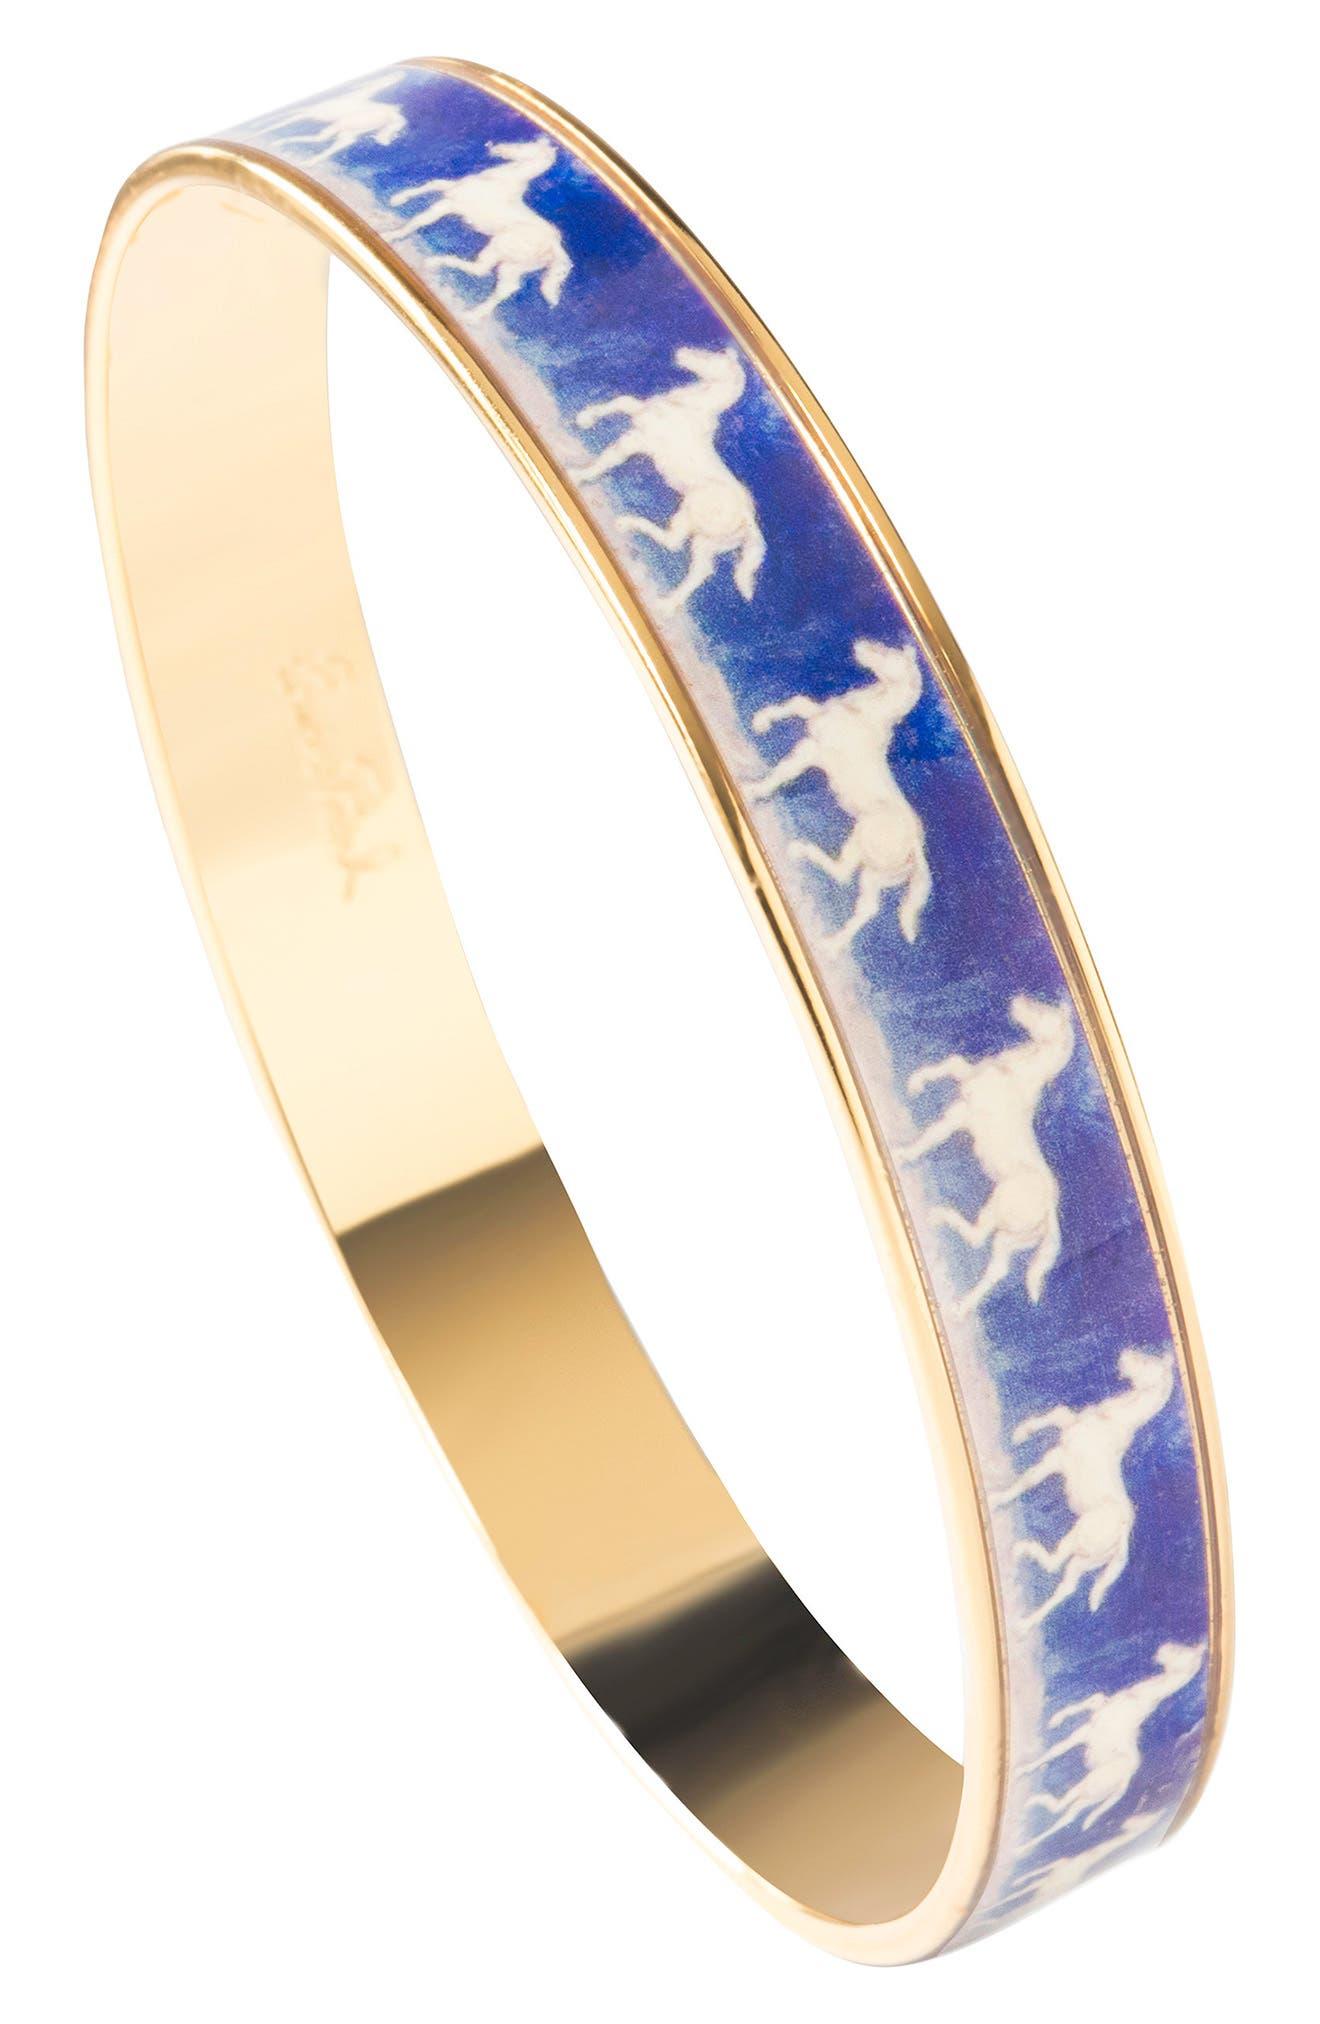 Blue Horse Medium Bracelet,                             Alternate thumbnail 2, color,                             Blue/ Gold